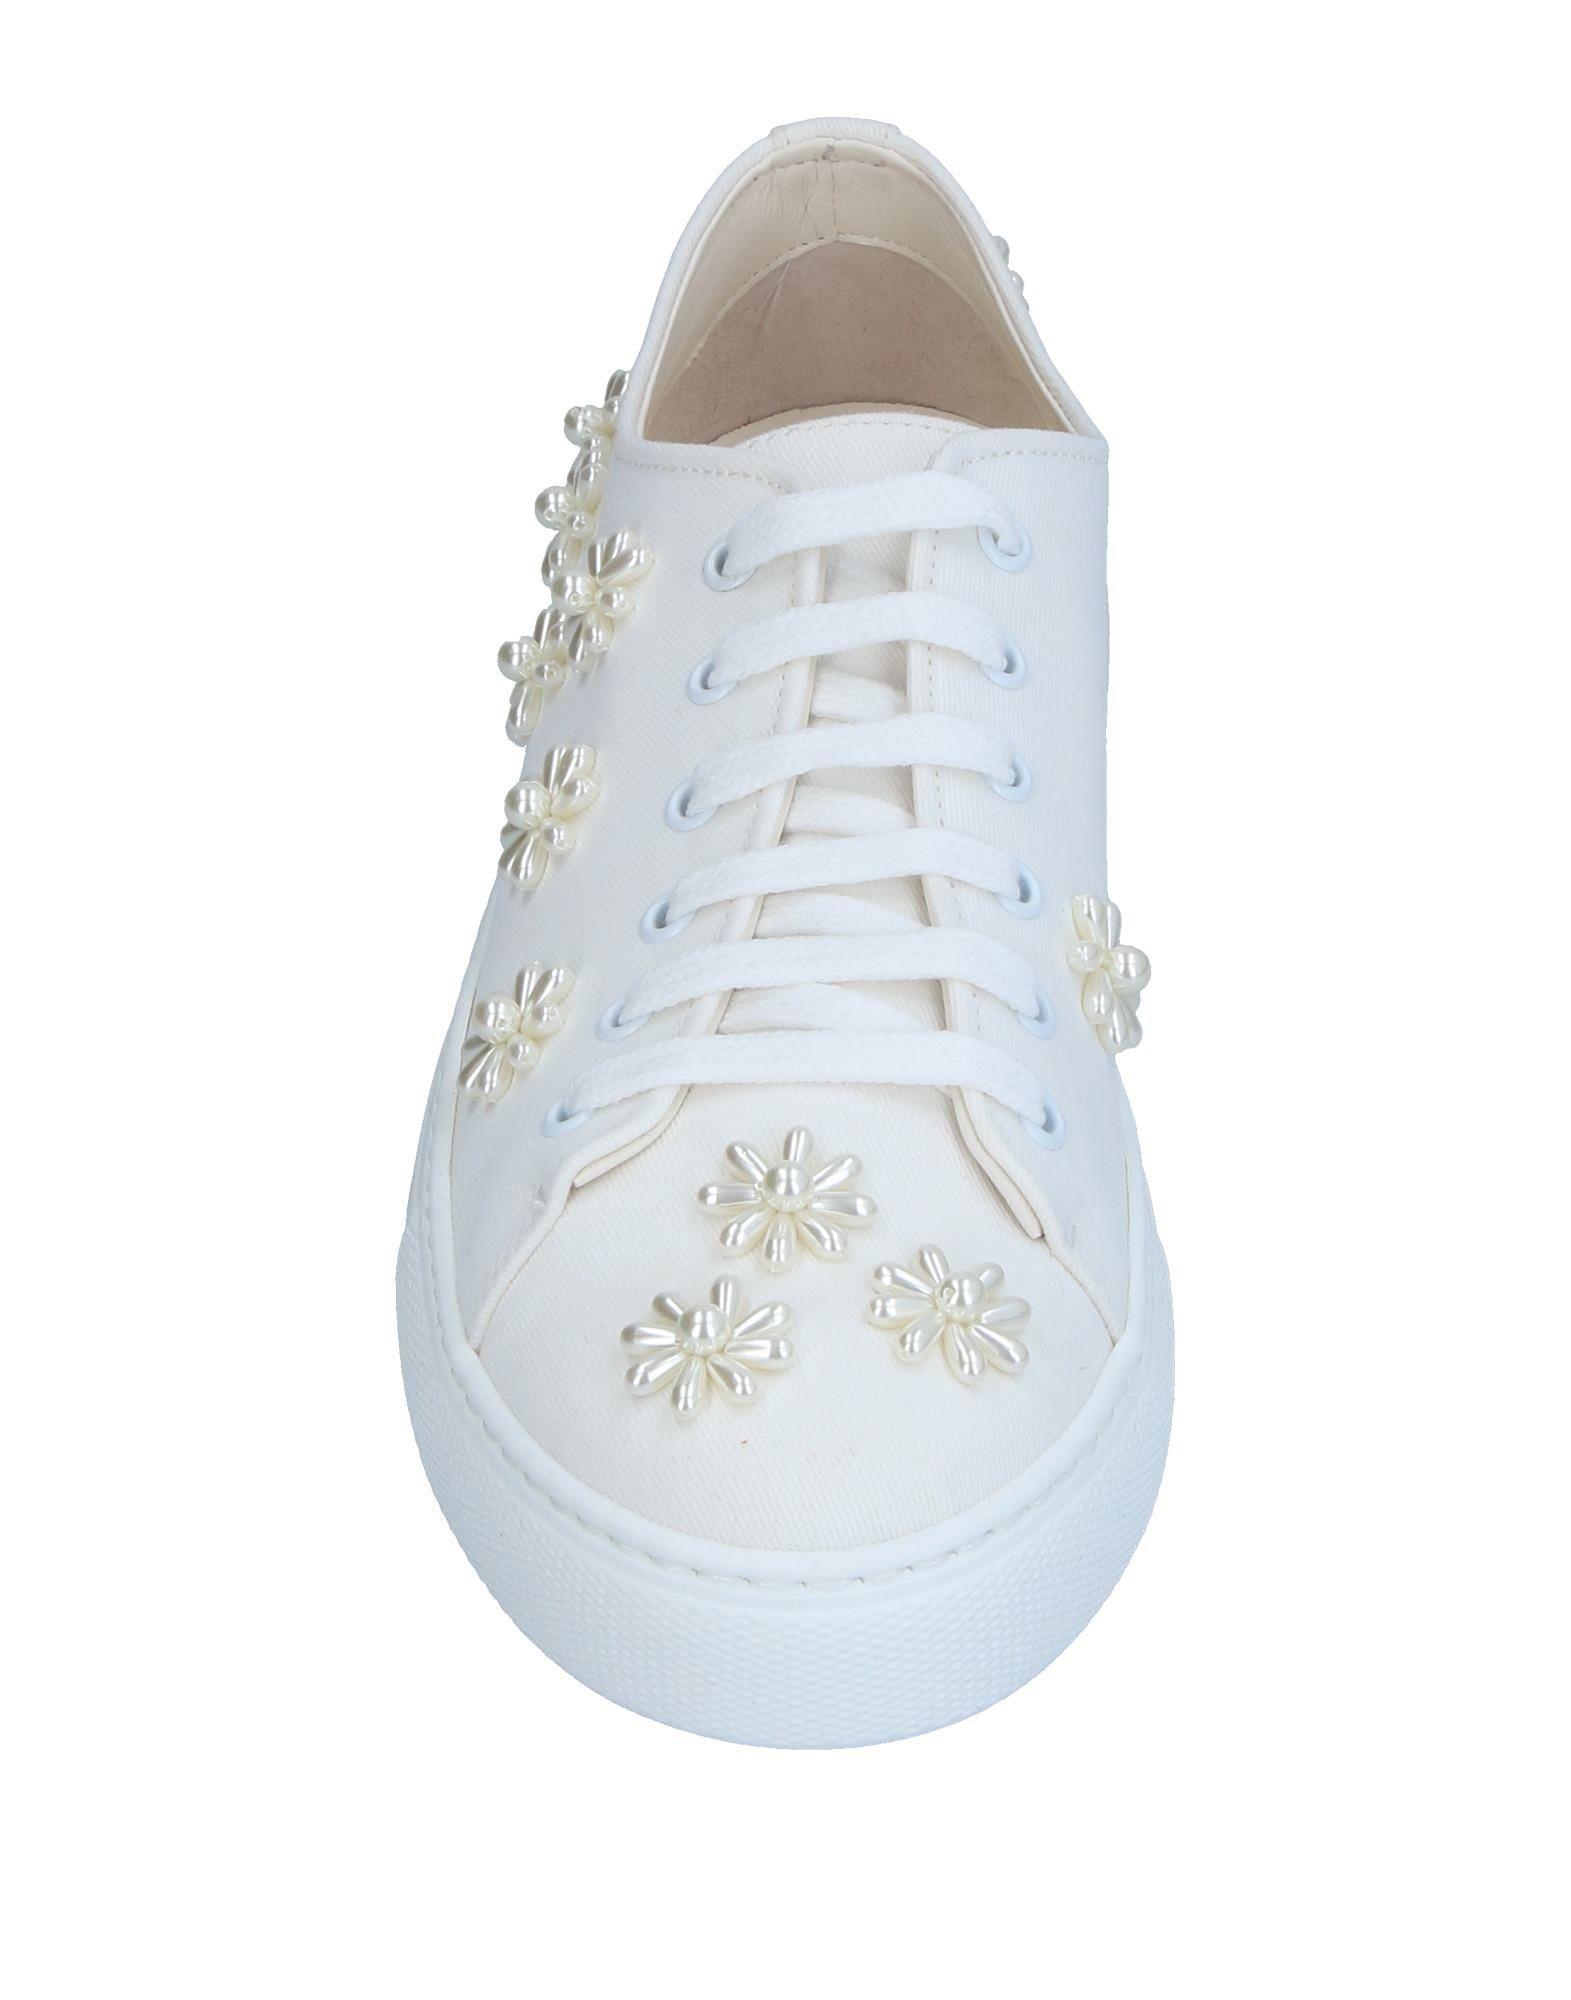 Simone Rocha Sneakers - Women Simone Rocha Canada Sneakers online on  Canada Rocha - 11337711VU 835735